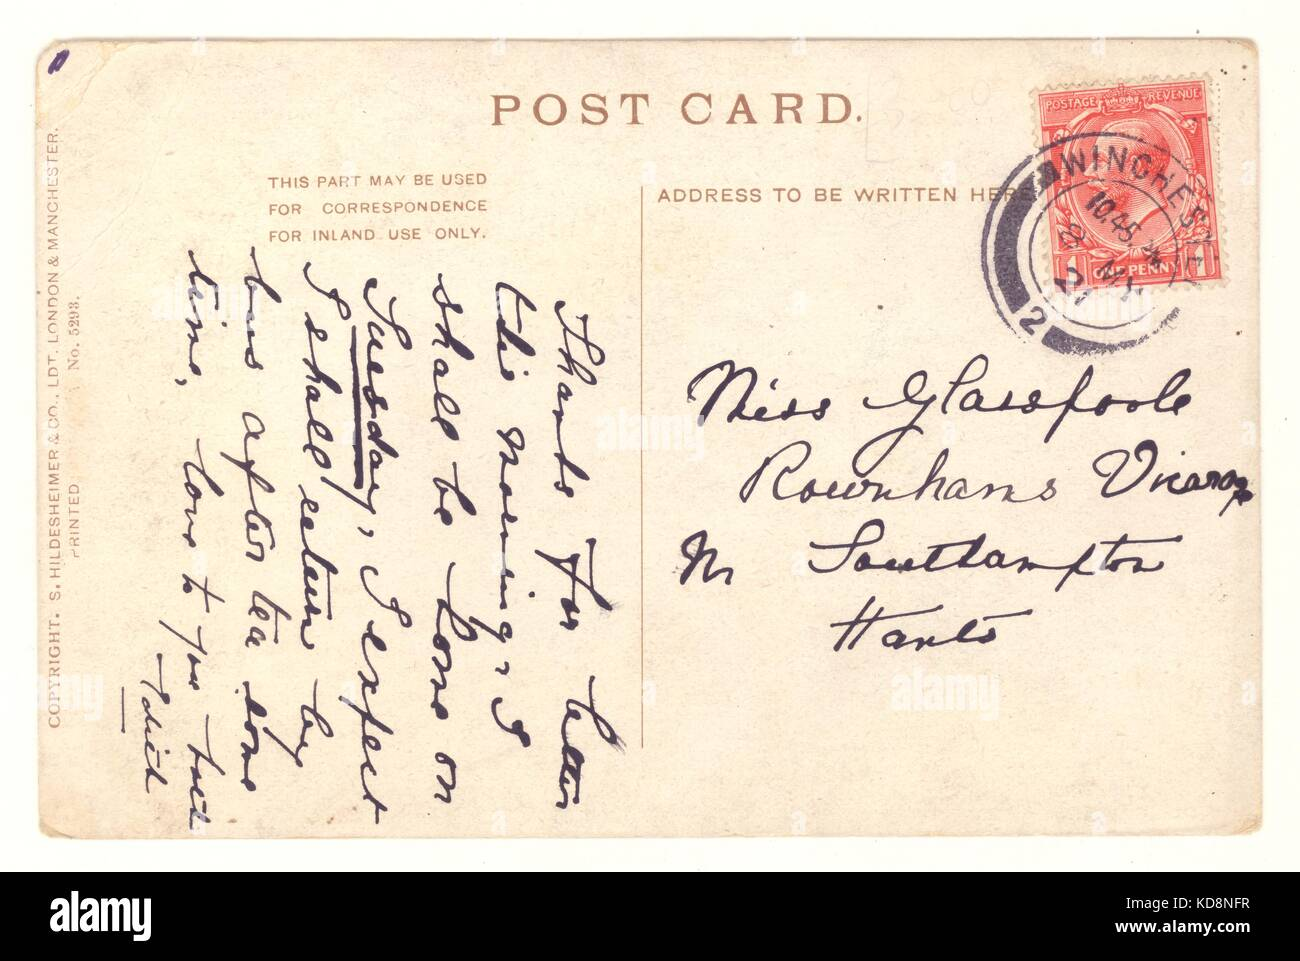 Reverse of postcard, postmarked 1921 - Stock Image